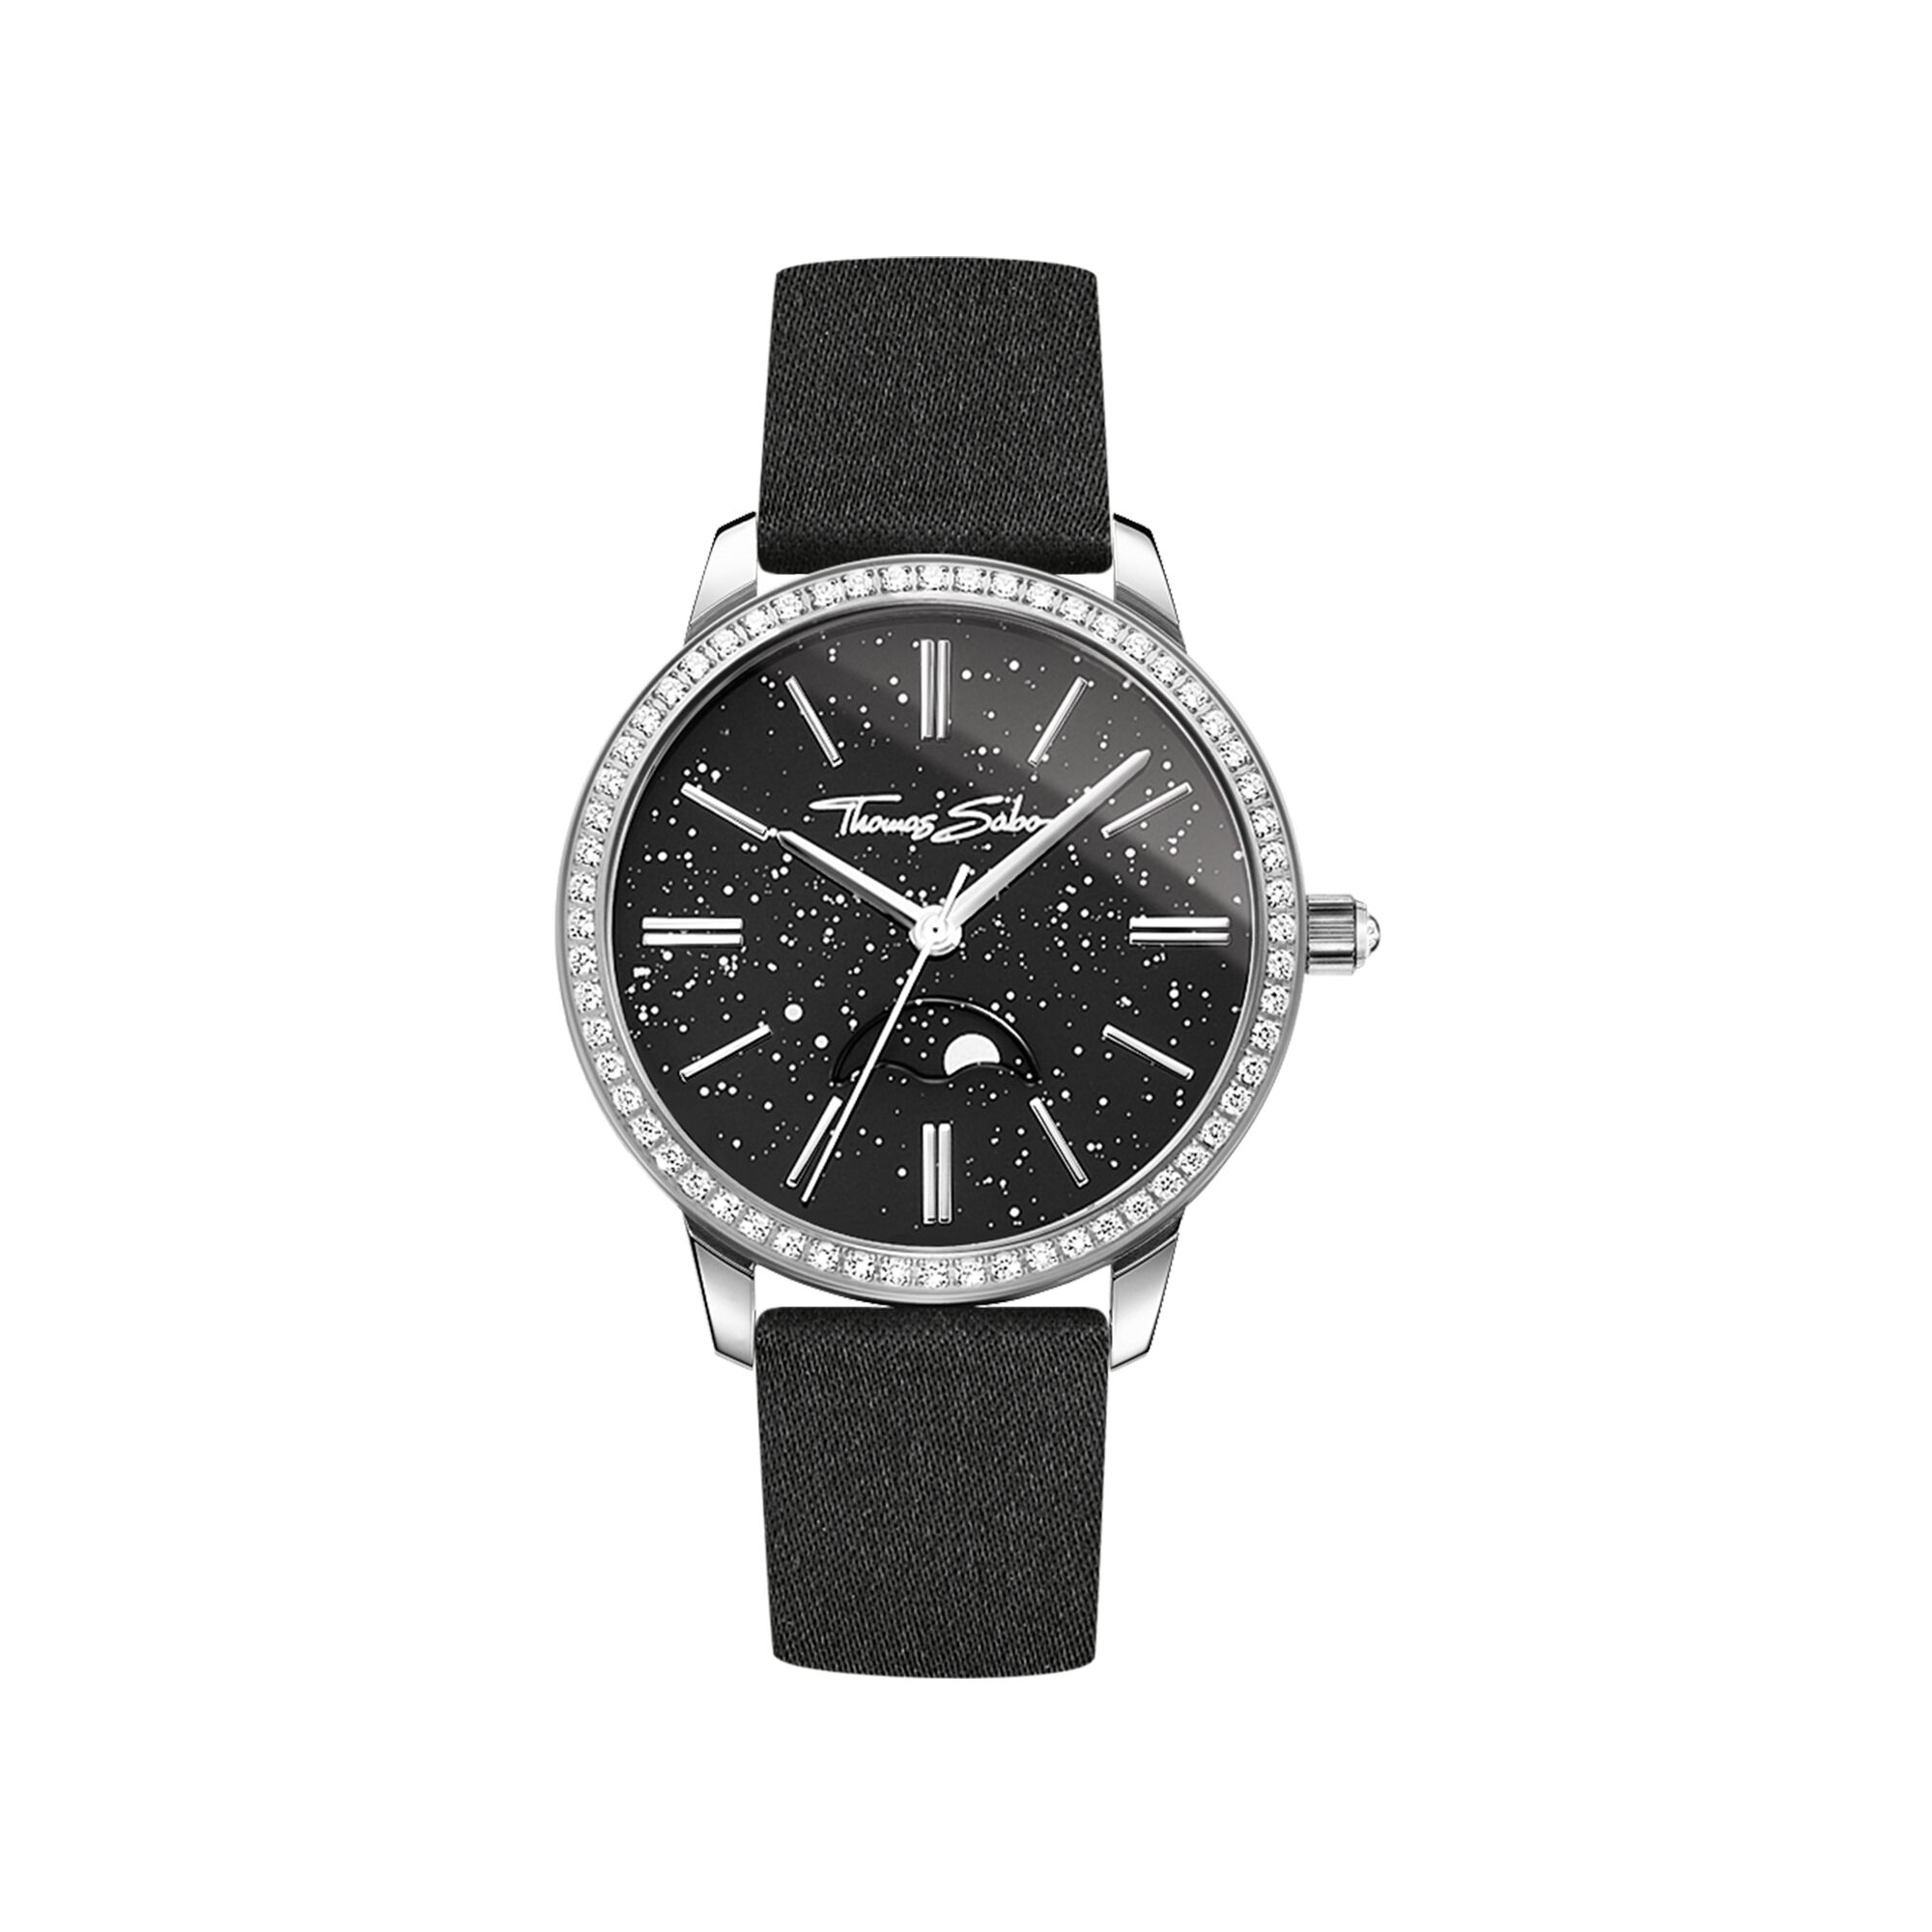 ساعة سوداء من توماس سابو «Thomas Sabo»